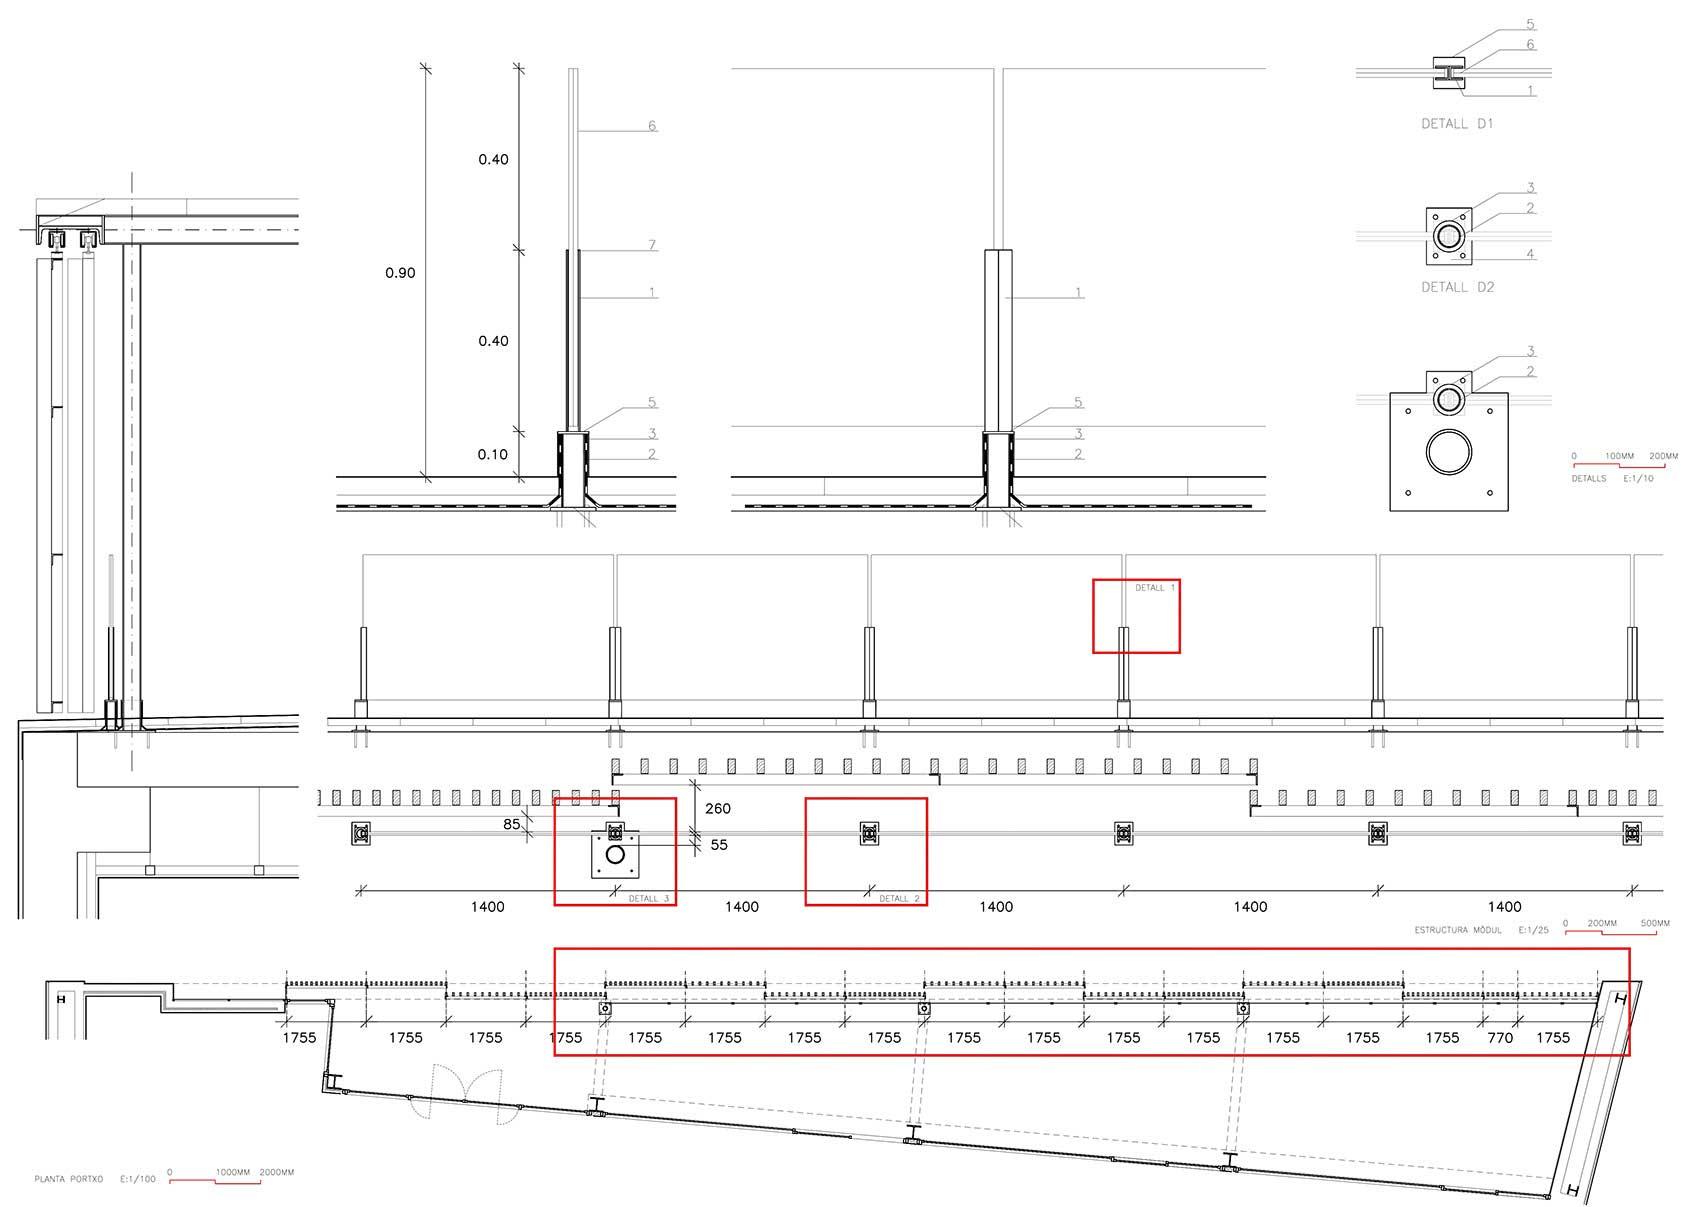 Detalle barandilla vidrio awesome amazing planos de for Detalle barandilla vidrio